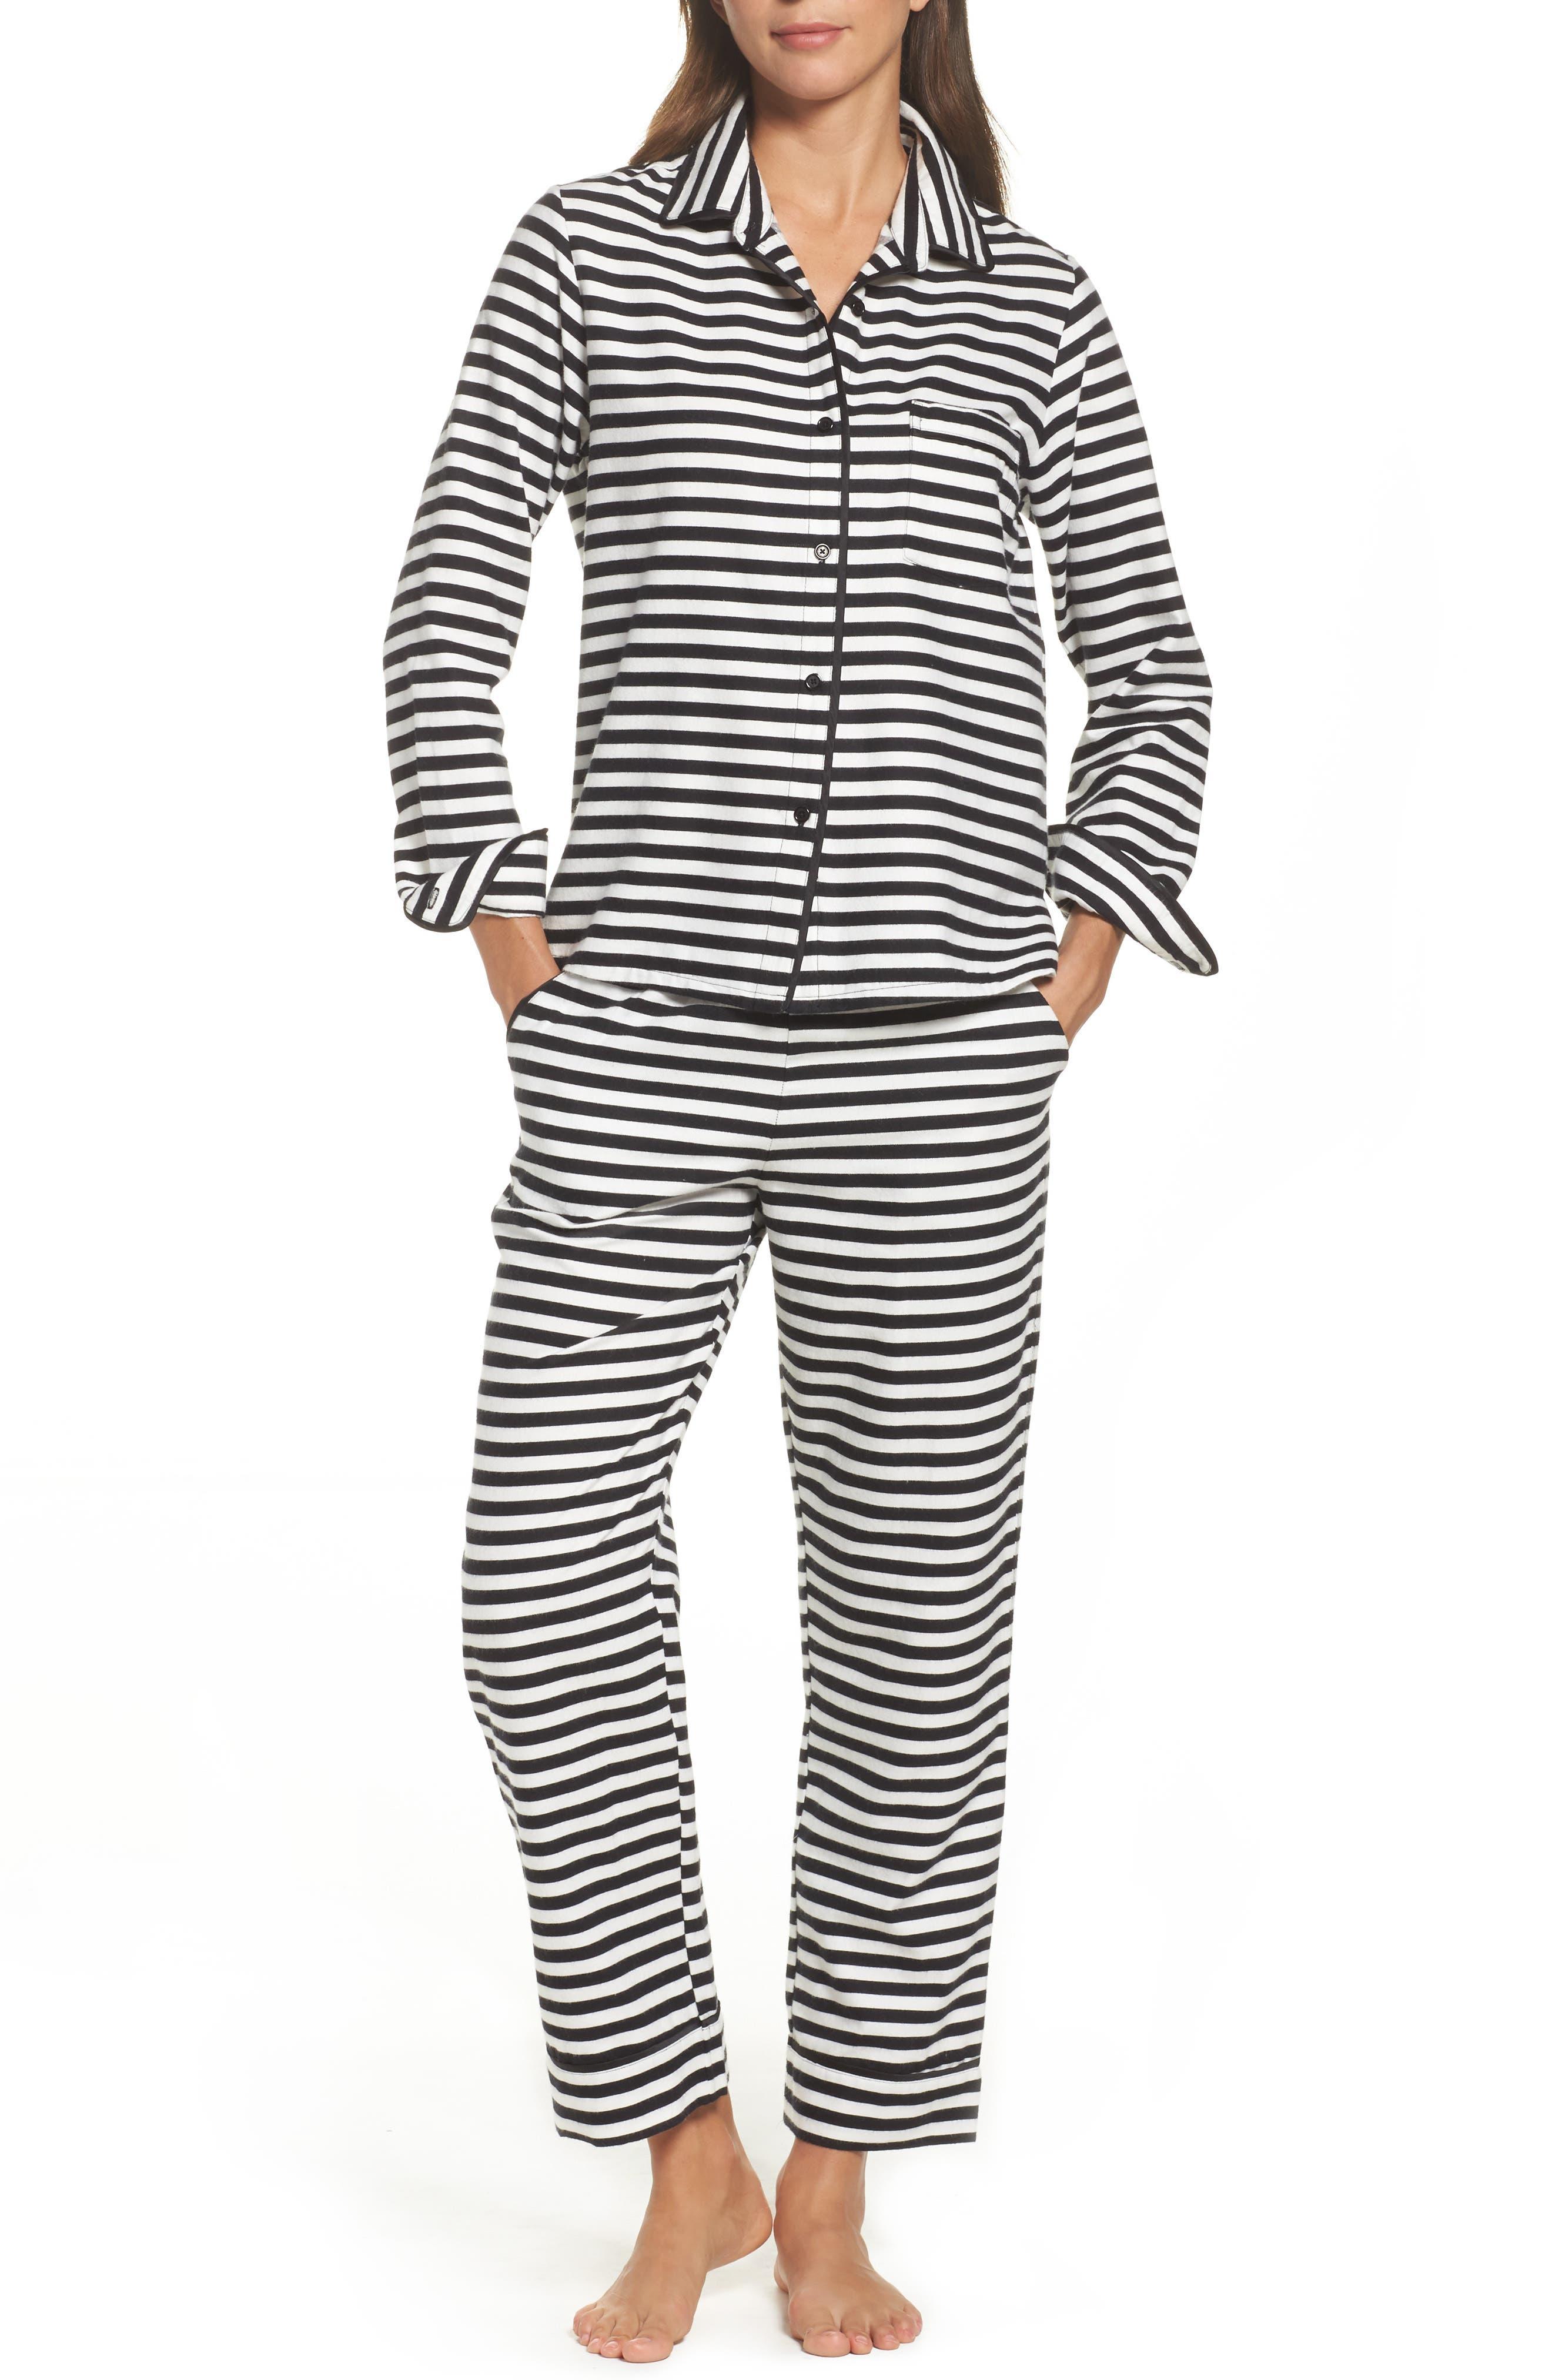 flannel pajamas, Main, color, 008